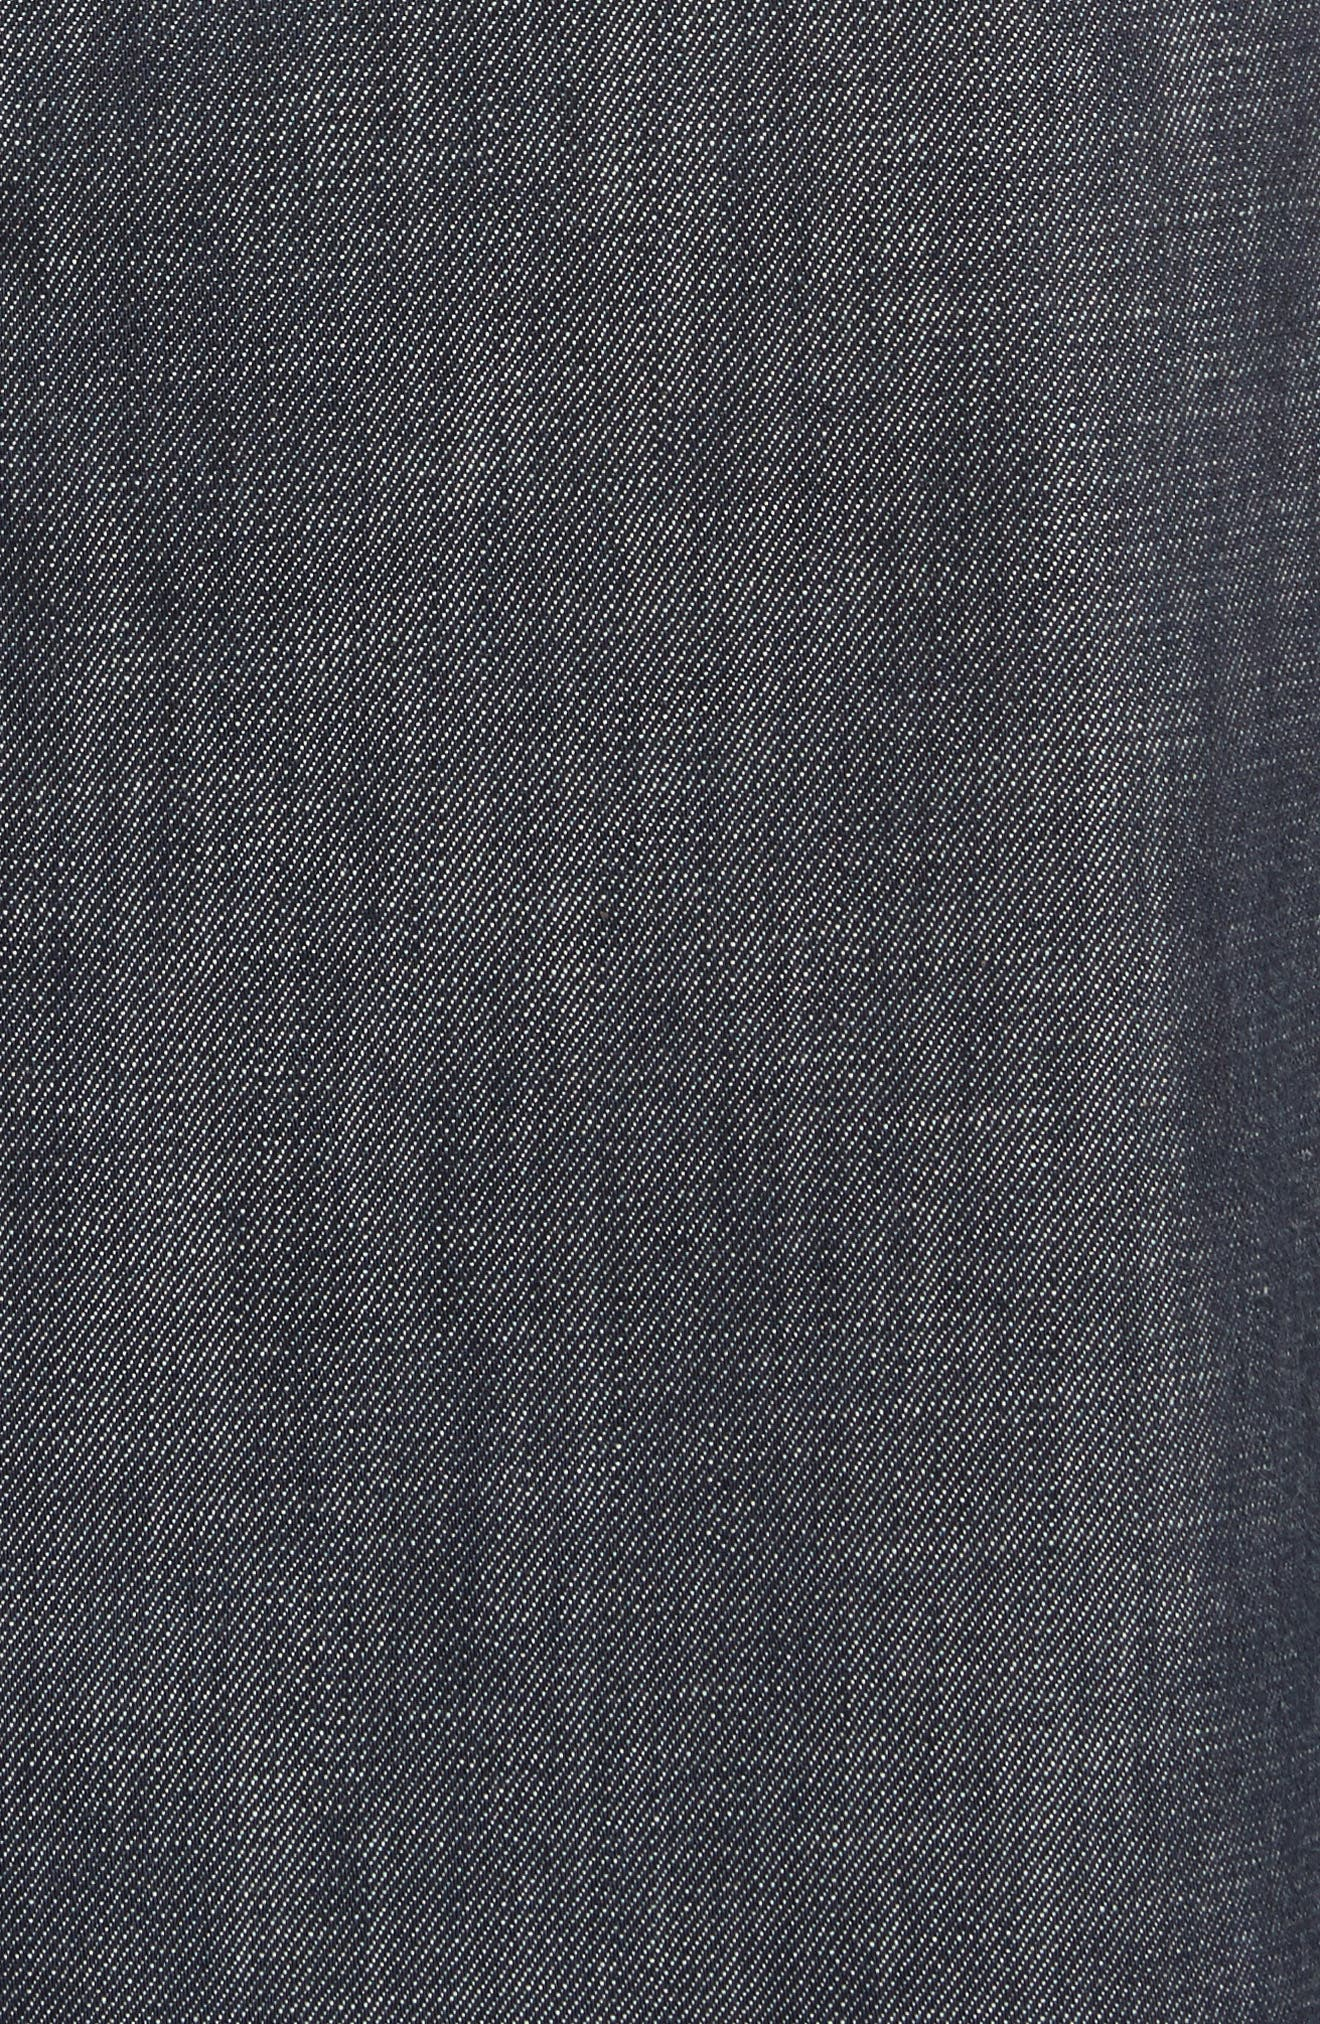 Alternate Image 5  - Tibi Snap Front Raw Denim Skirt